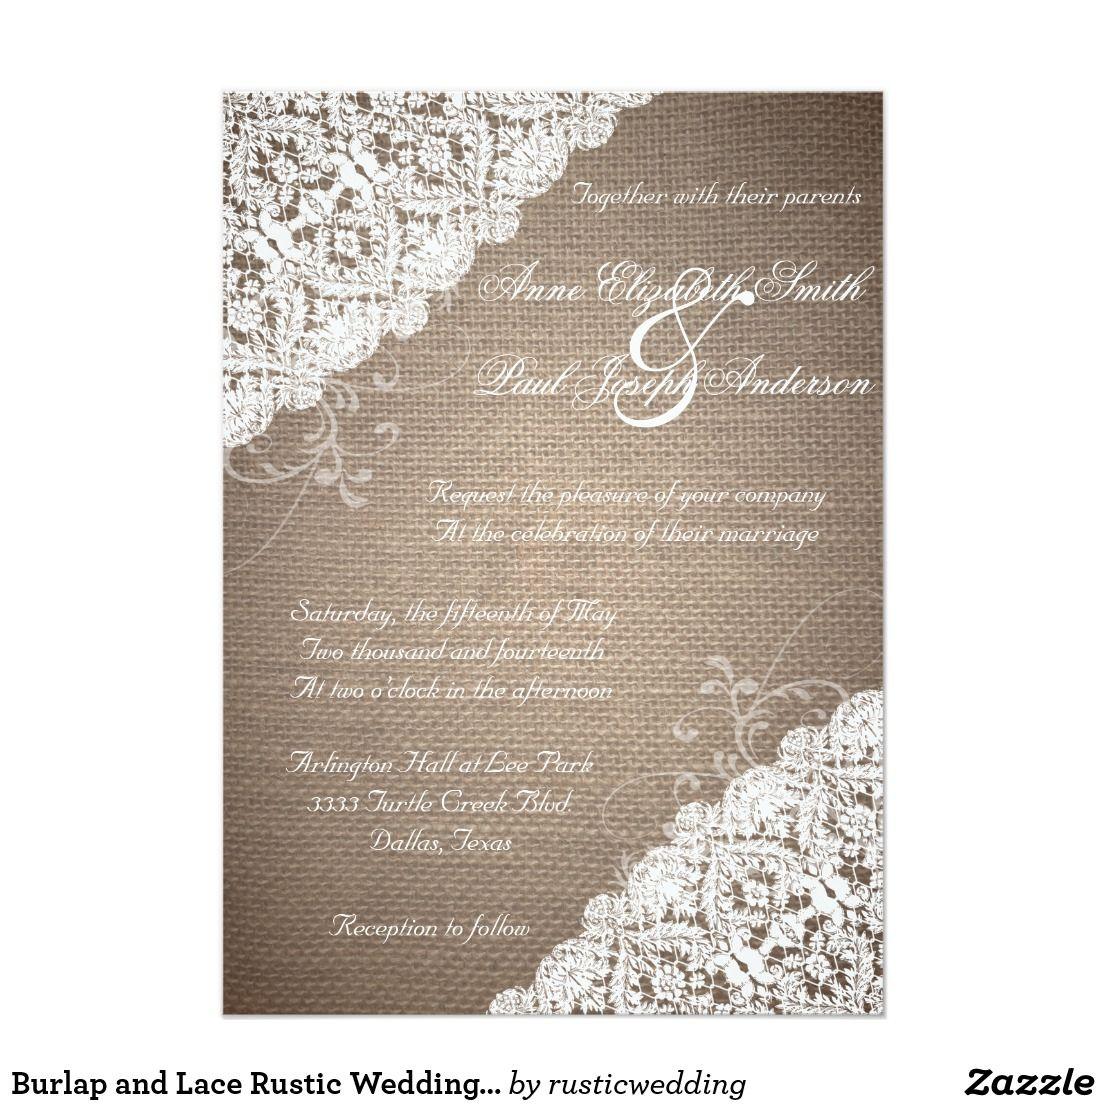 Creative clock background  Burlap and Lace Rustic Wedding InvitationThese beautiful rustic